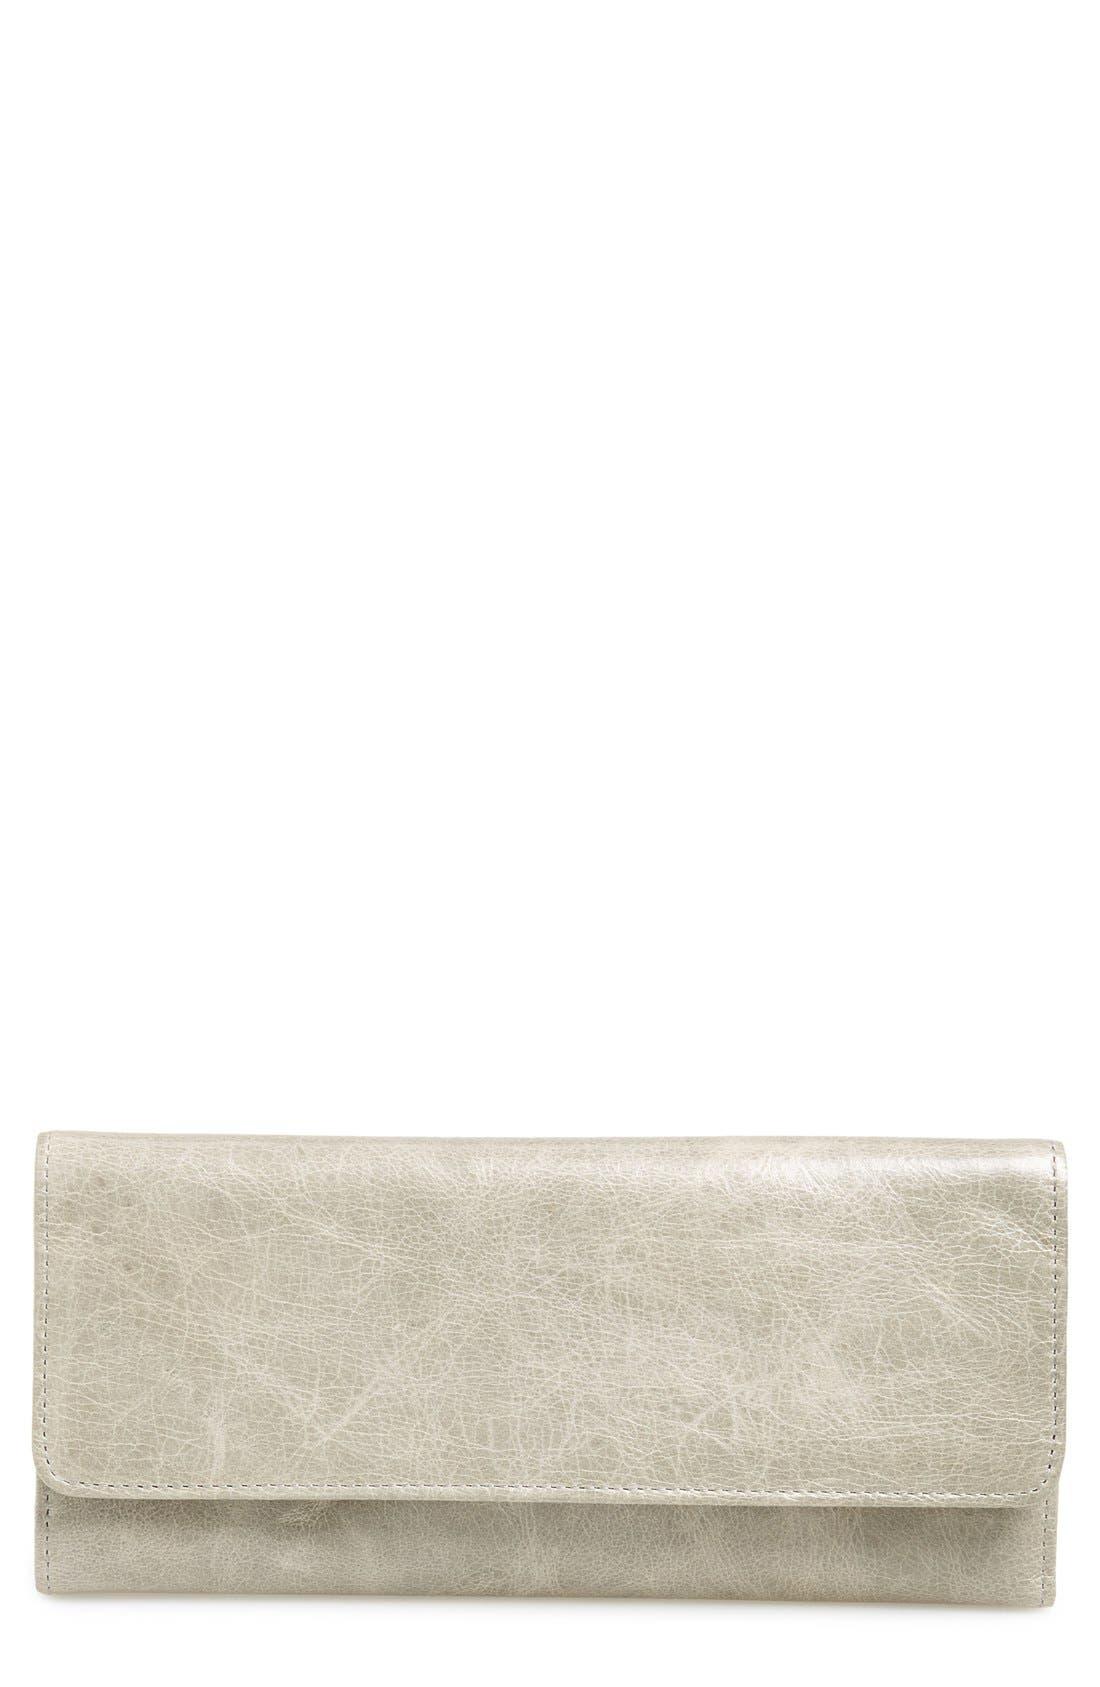 'Sadie' Leather Wallet,                             Main thumbnail 15, color,